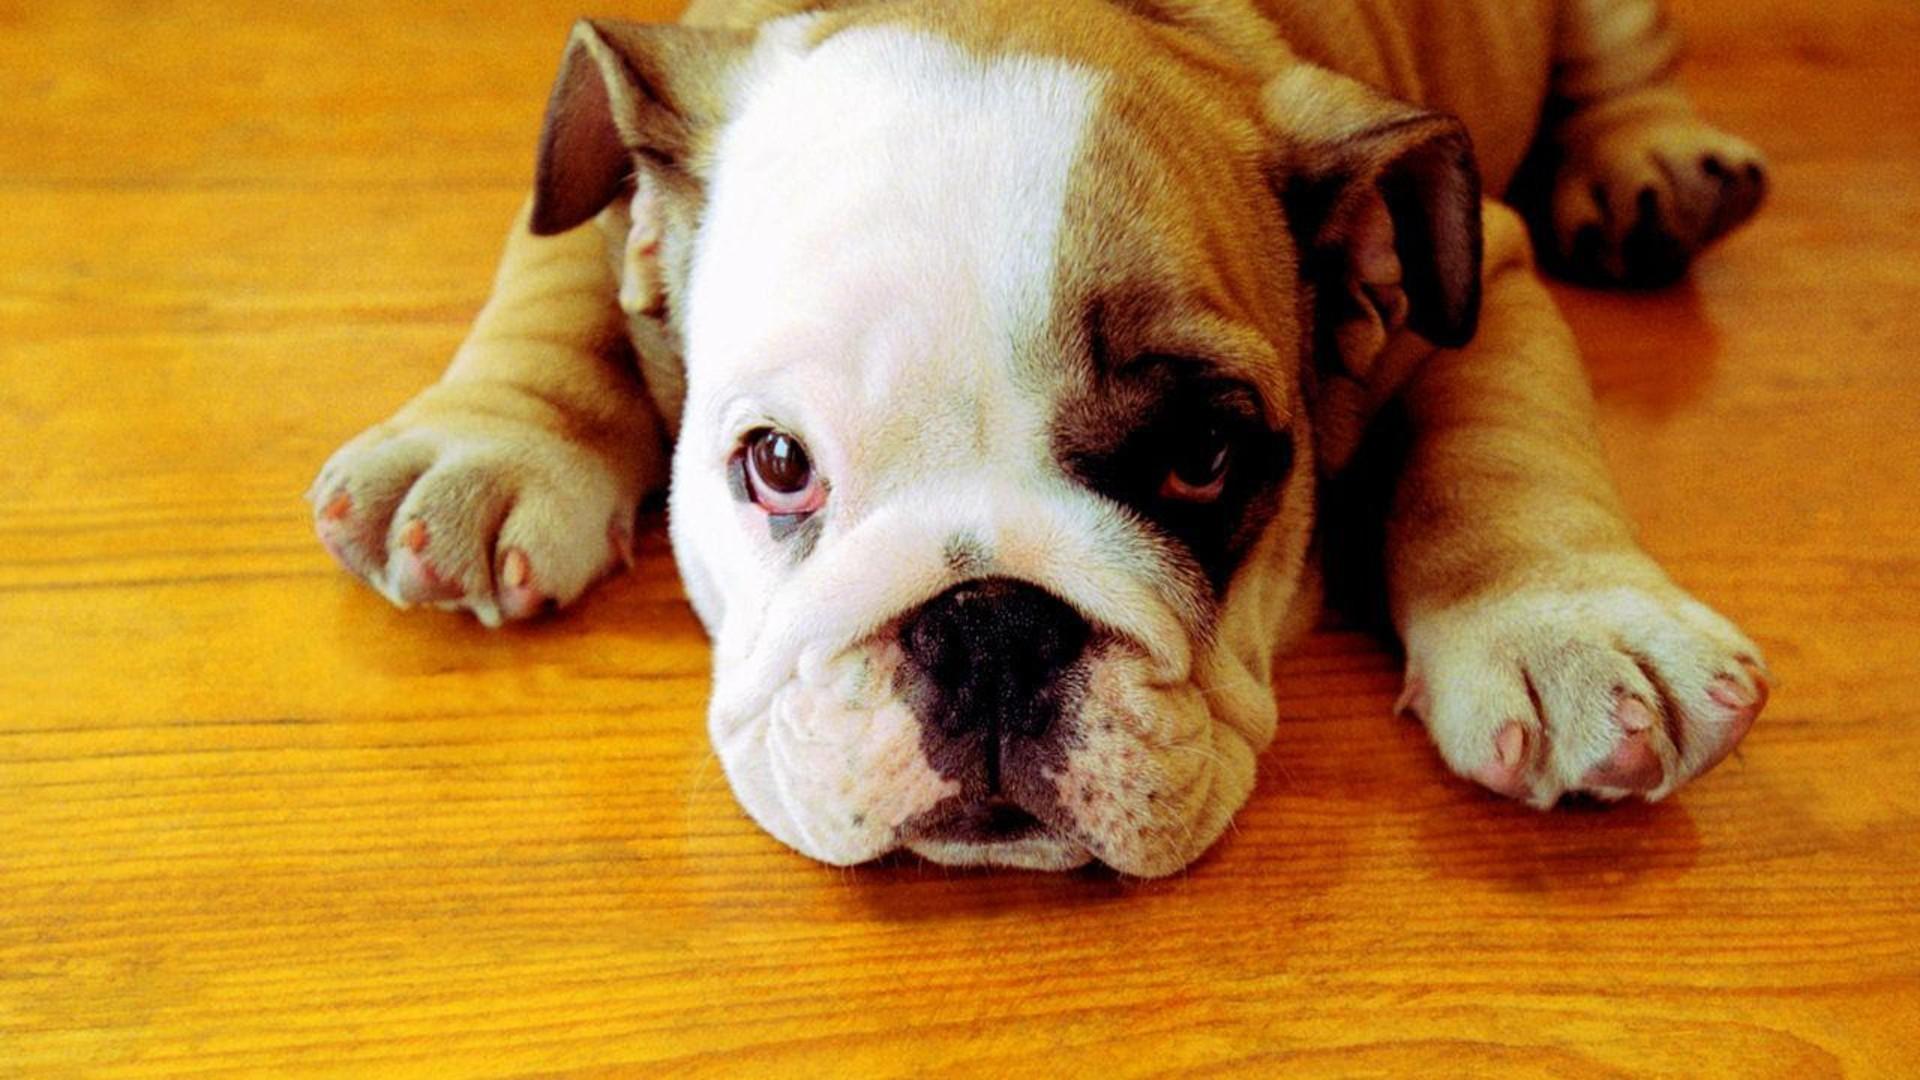 Bulldog-Puppies-Wallpaper-1